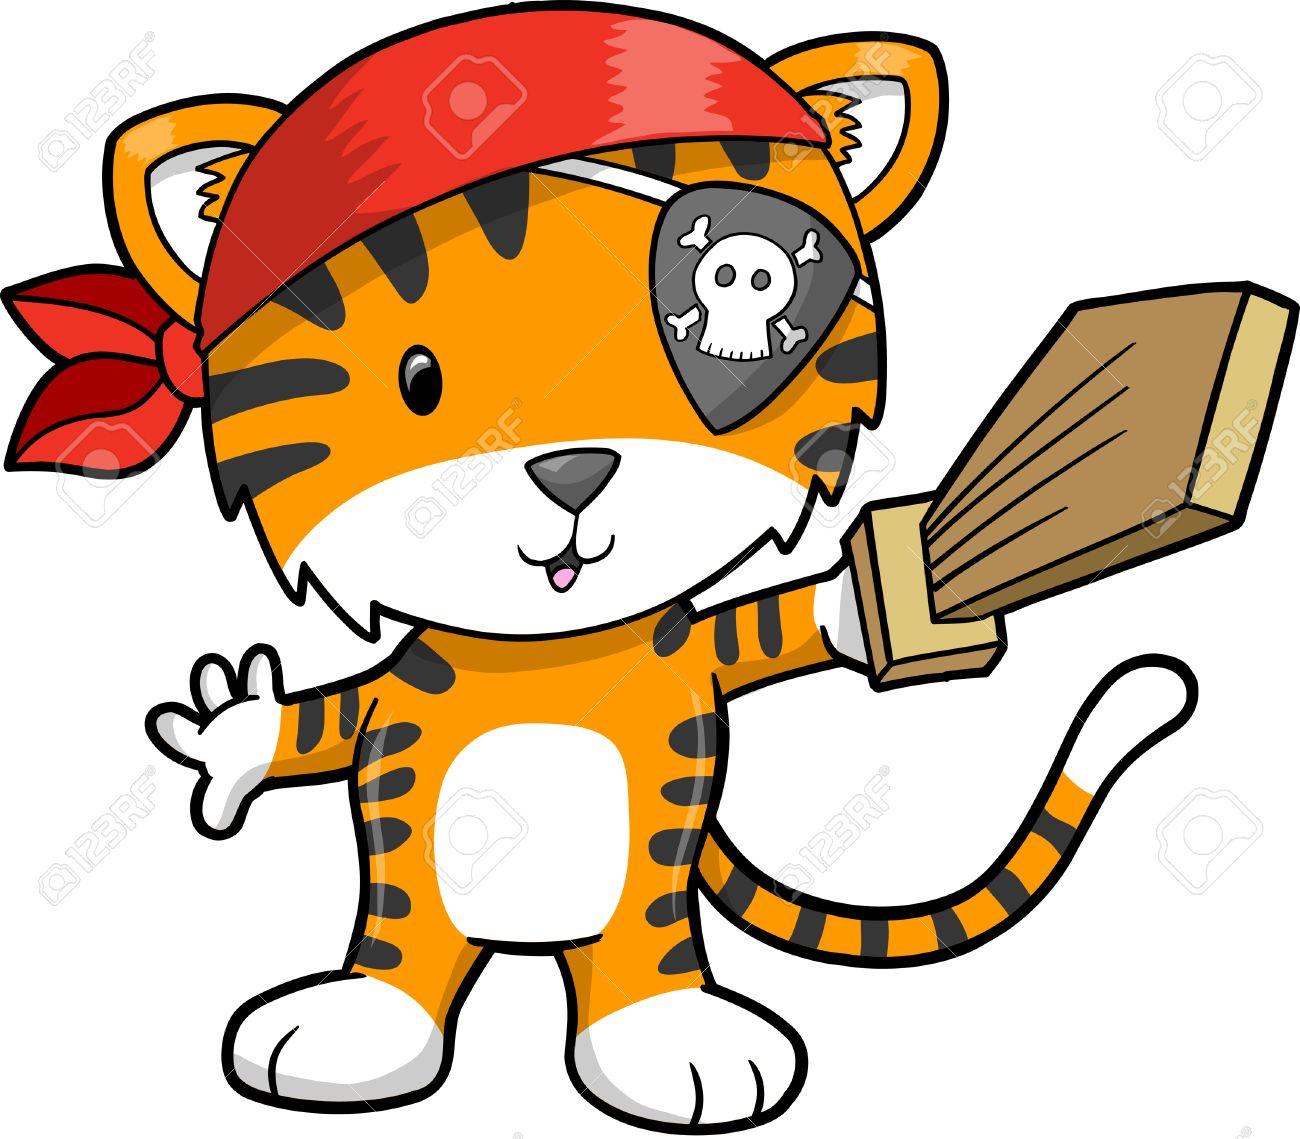 Pirate Tiger Illustration - 6726544